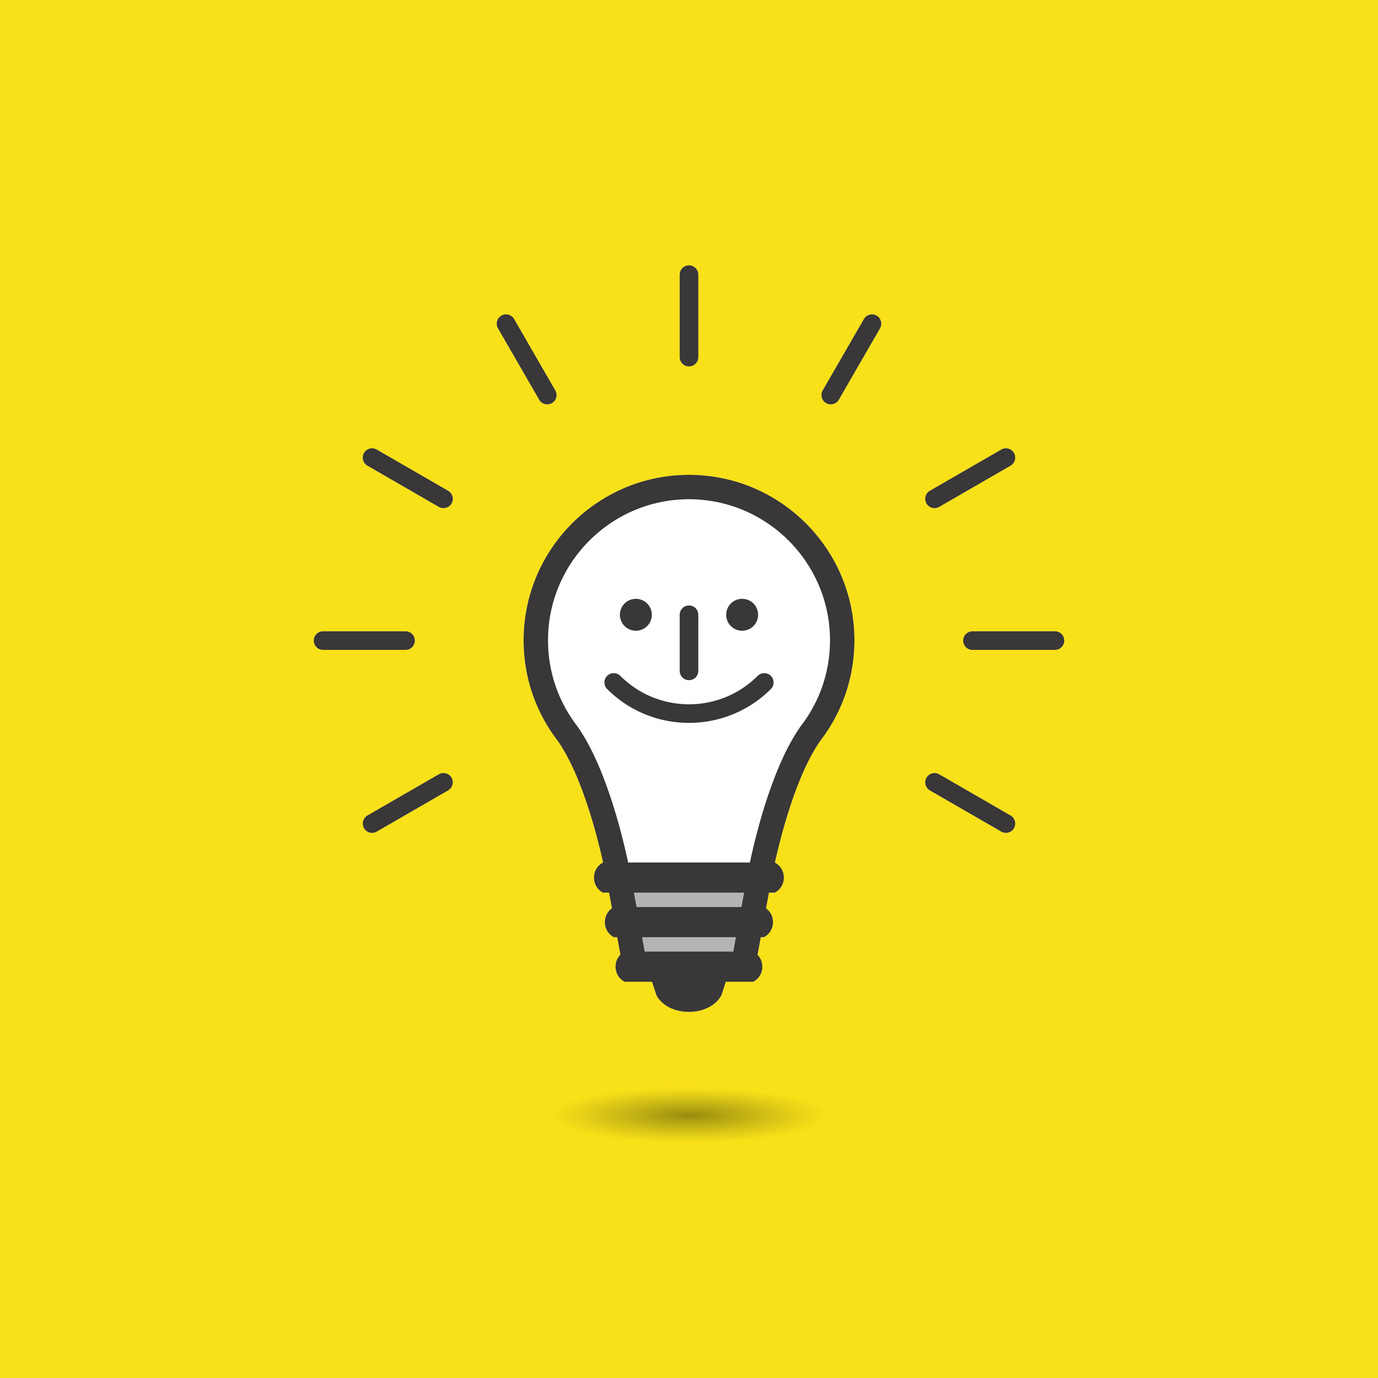 Smile face bulb